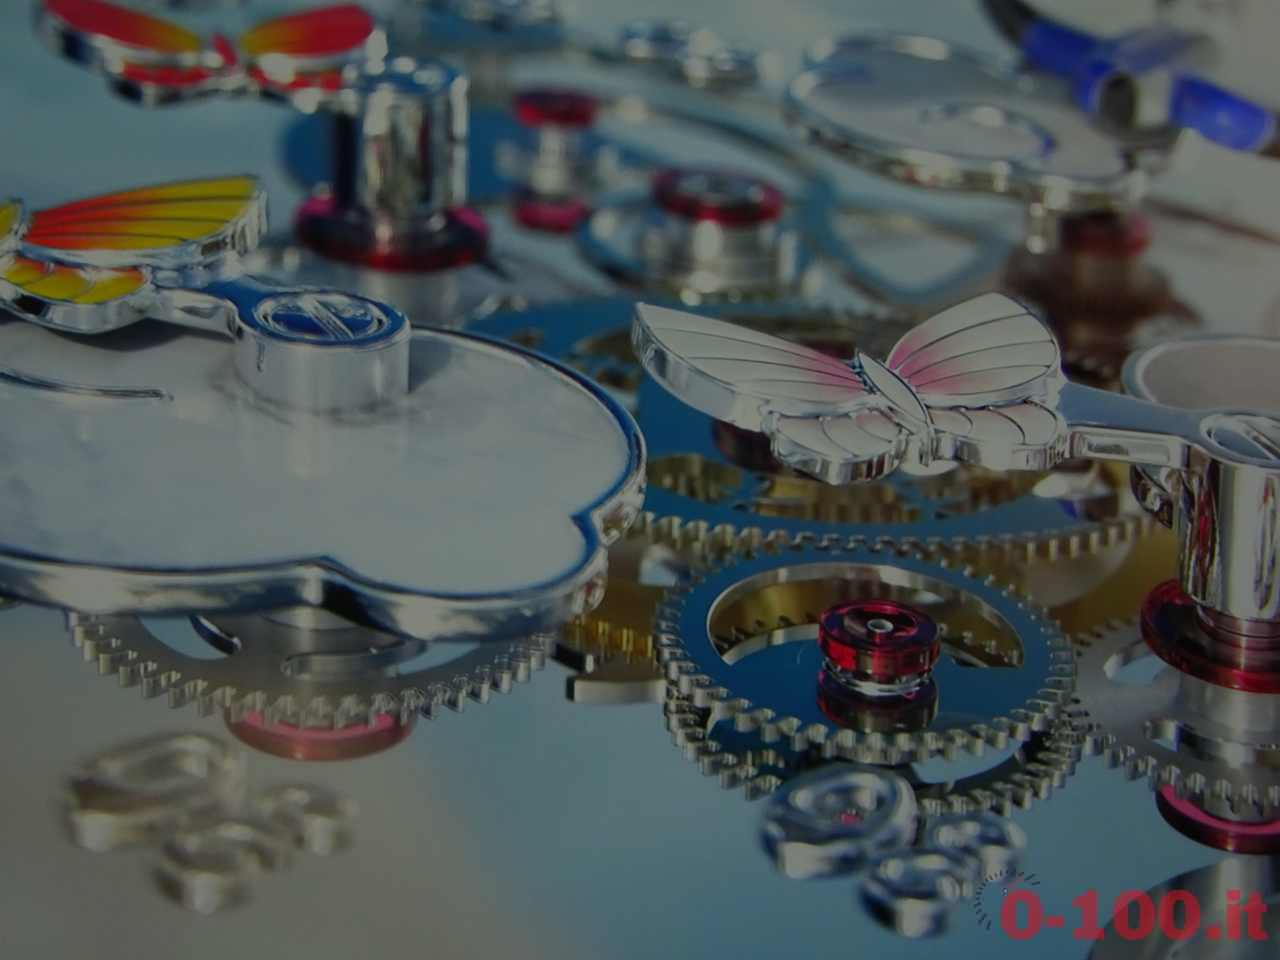 speciale-sihh-2016-lo-stand-van-cleef-arpels_0-10016